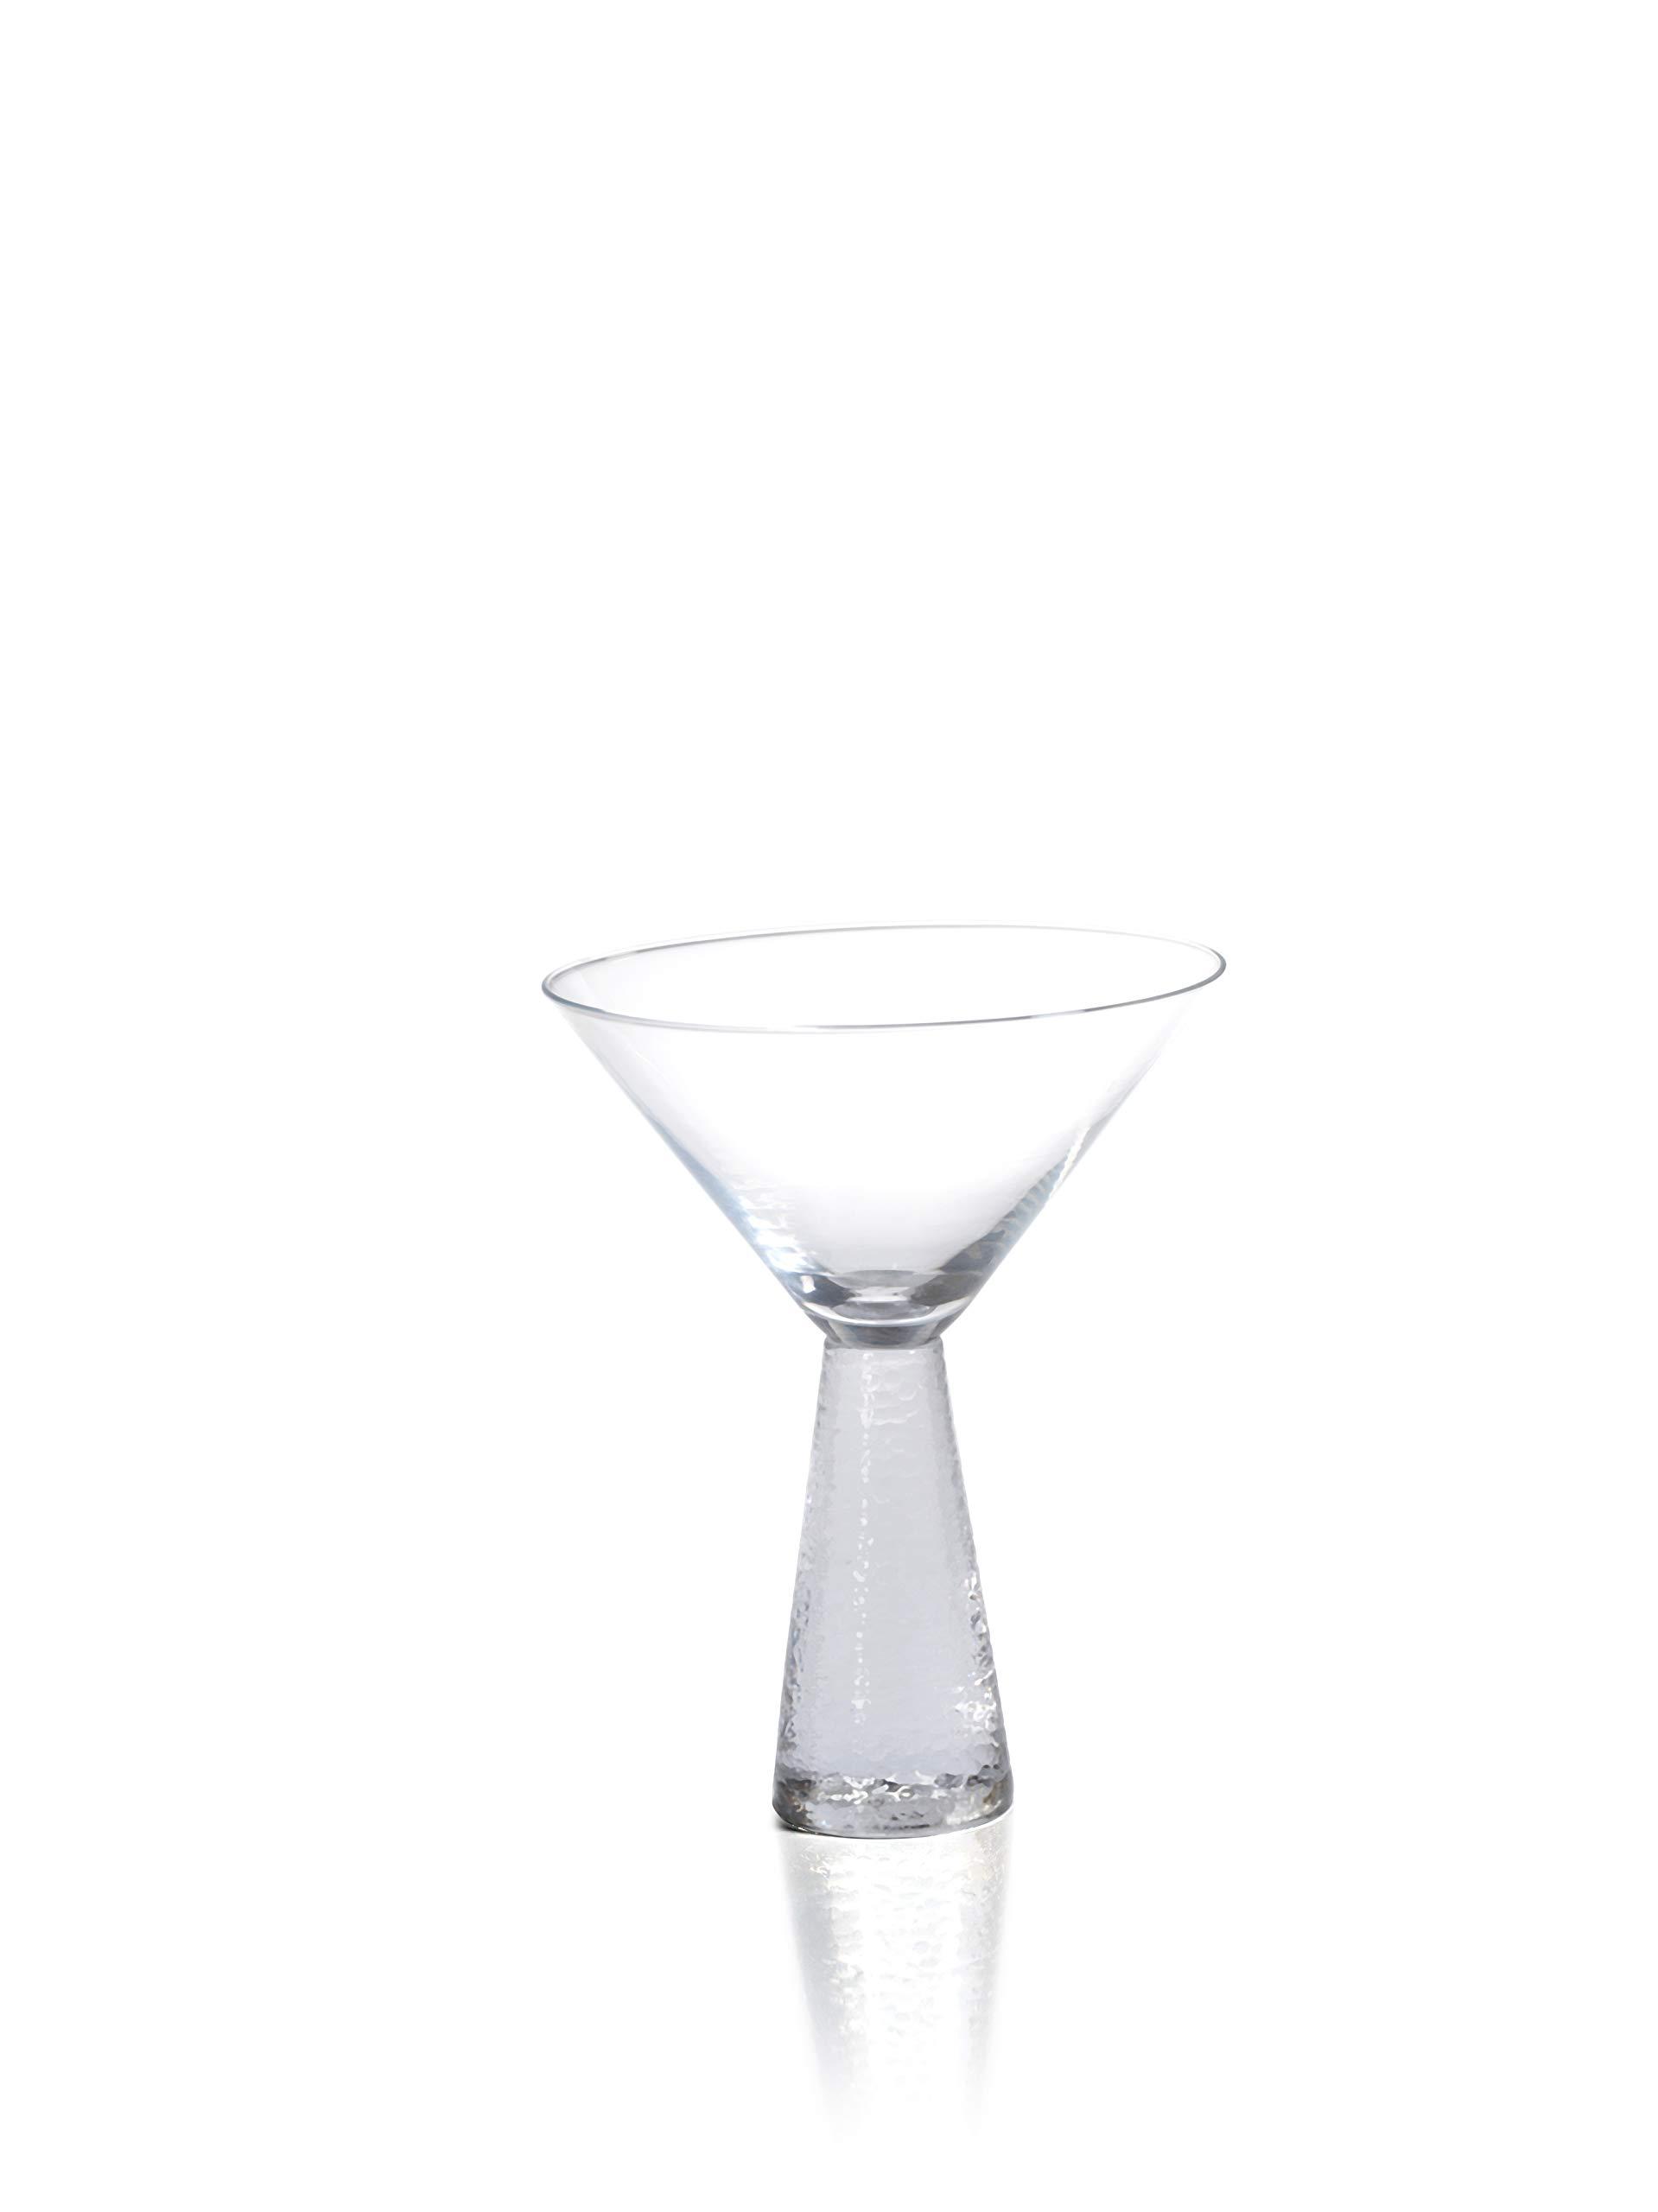 Zodax 6.25'' Tall Livogno Hammered Stem, (Set of 4) Martini Glasses, Clear